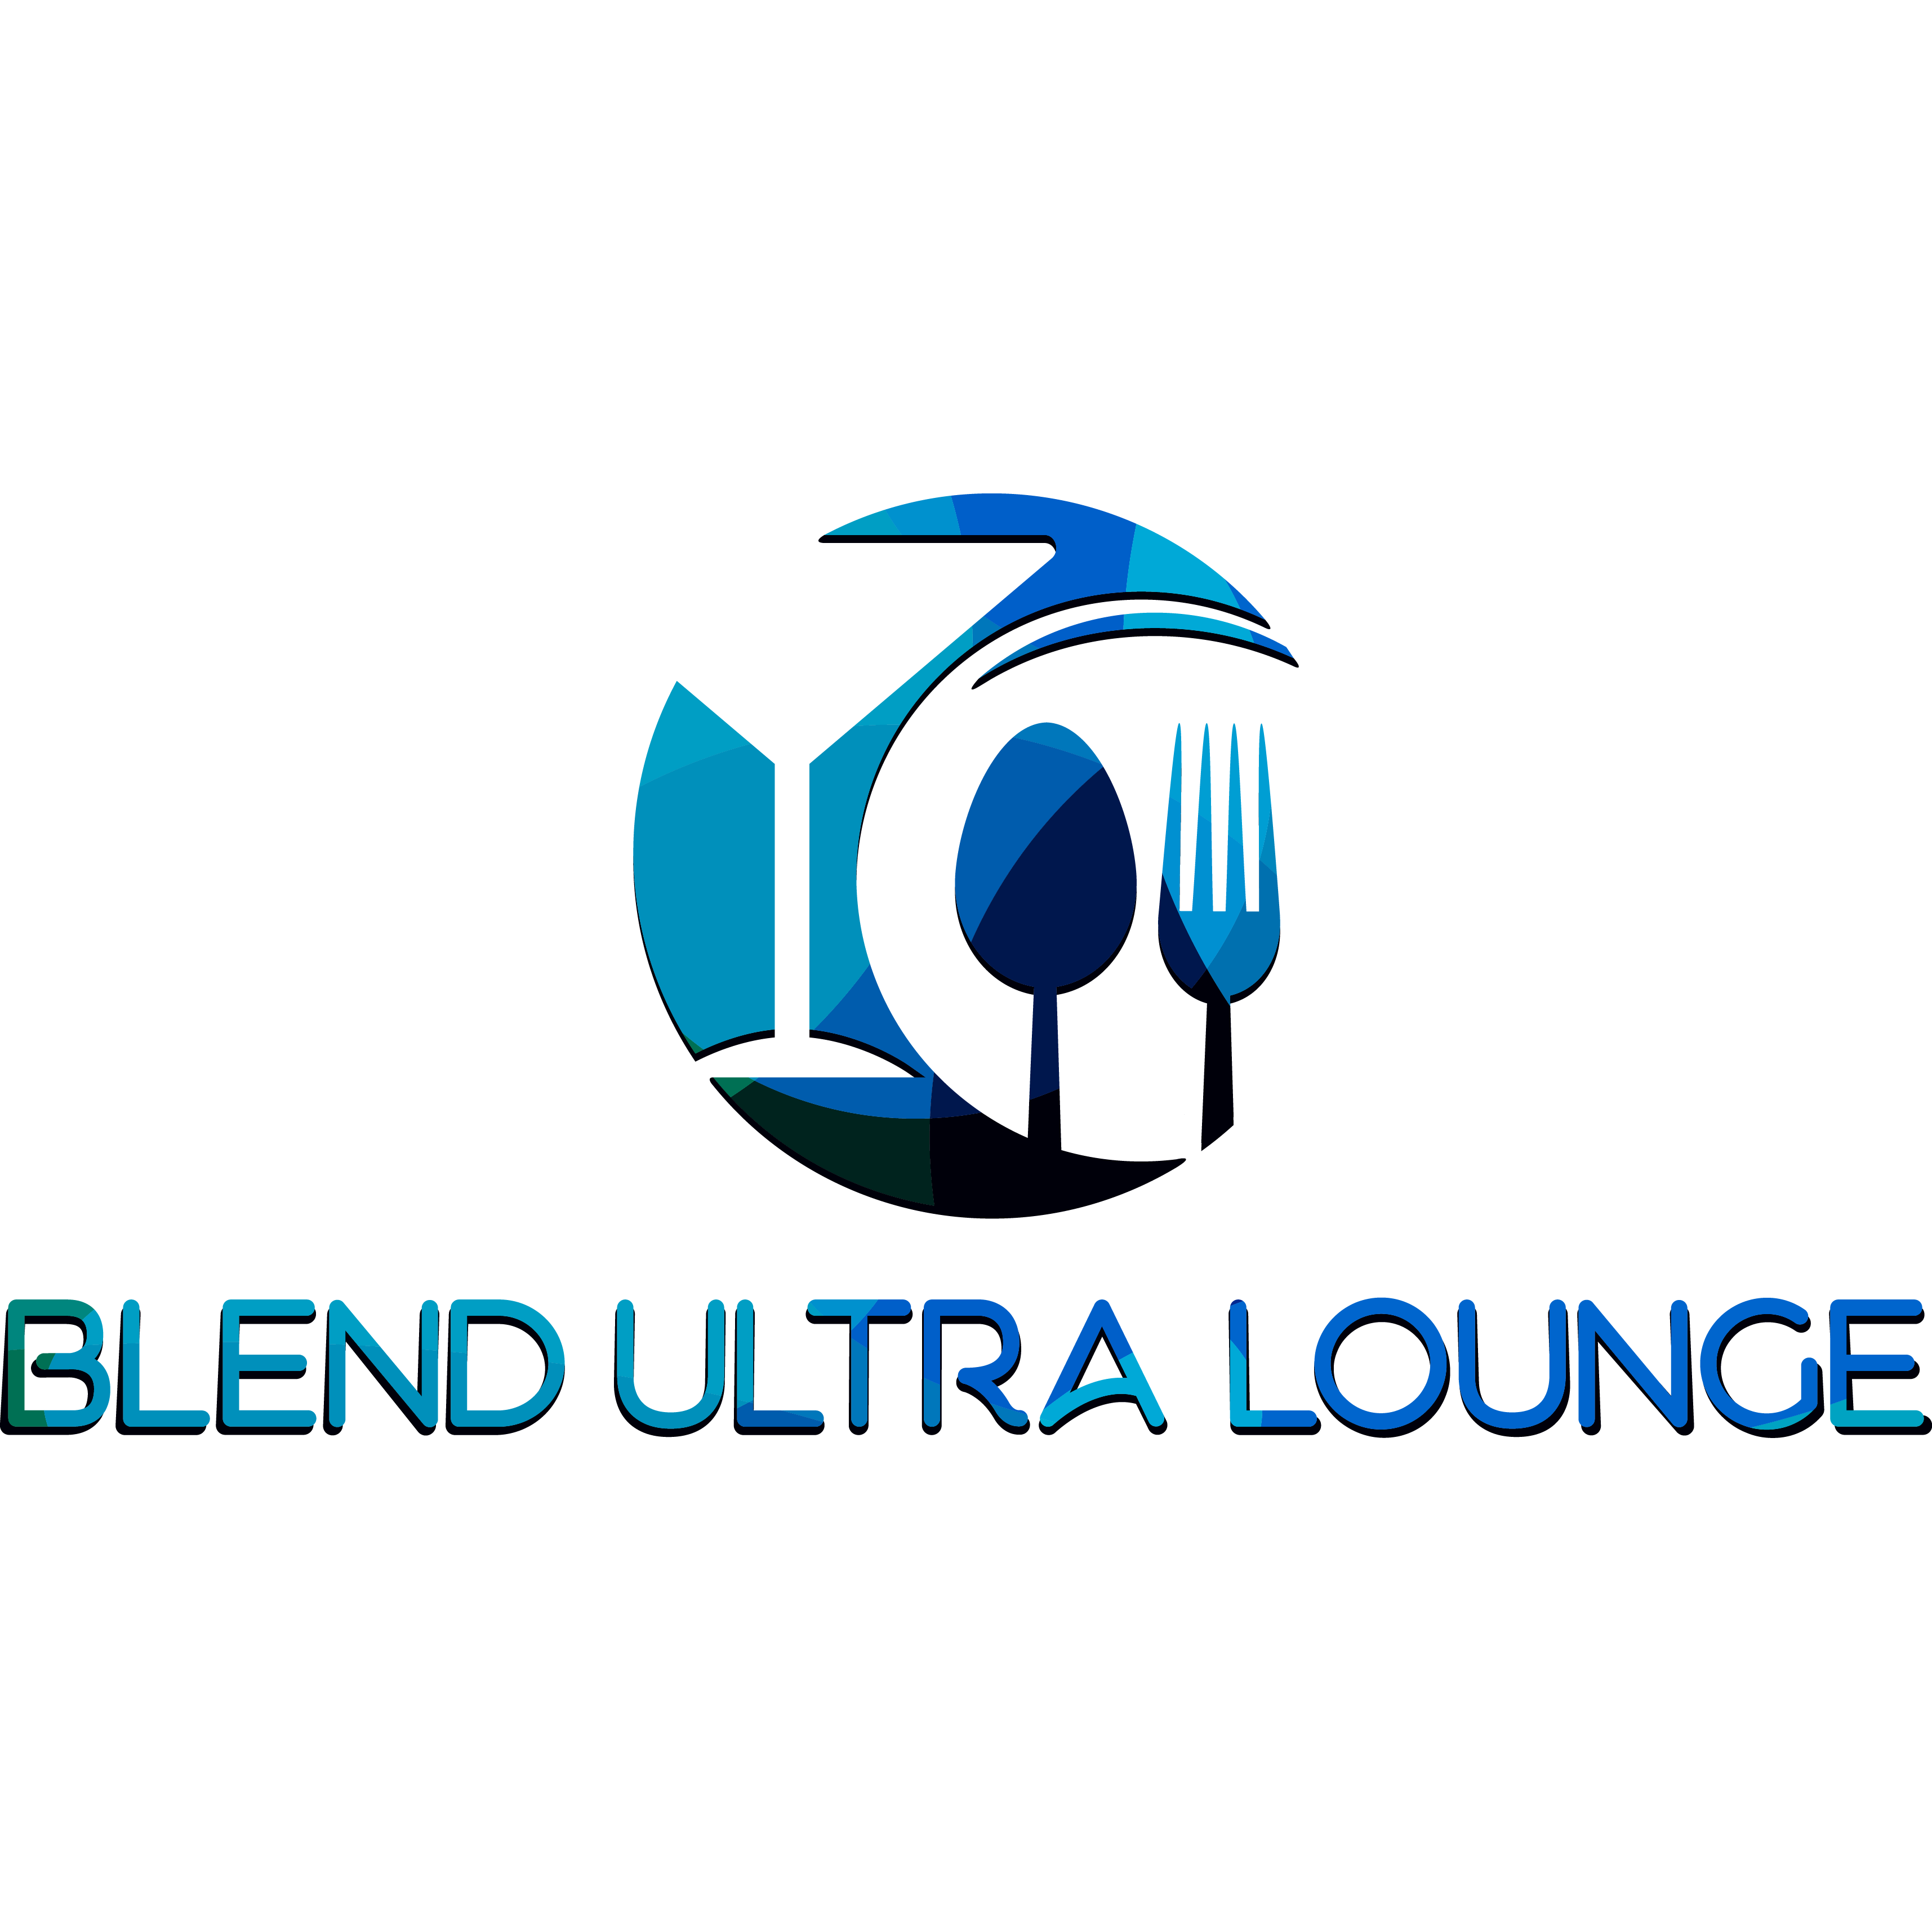 Blend Ultra Lounge